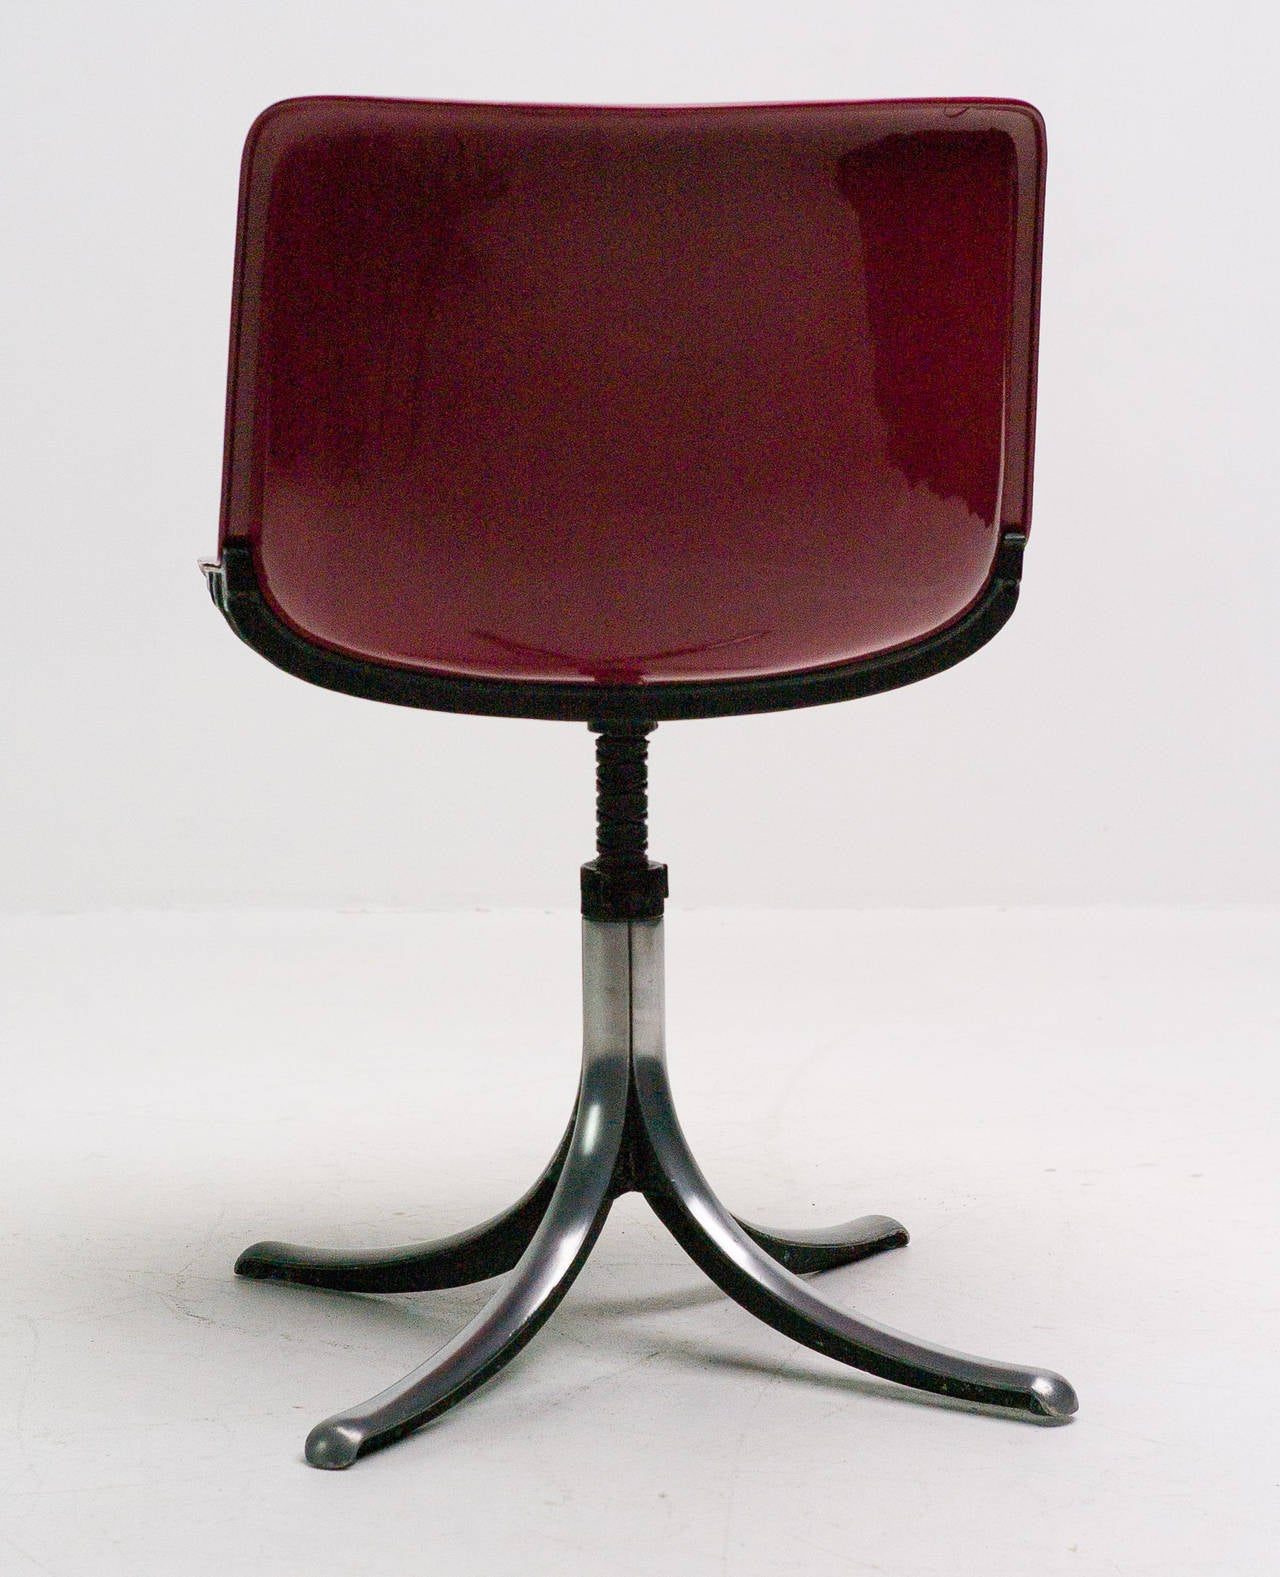 Set of Three Tecno Modus Chairs Designed by Osvaldo Borsani 5